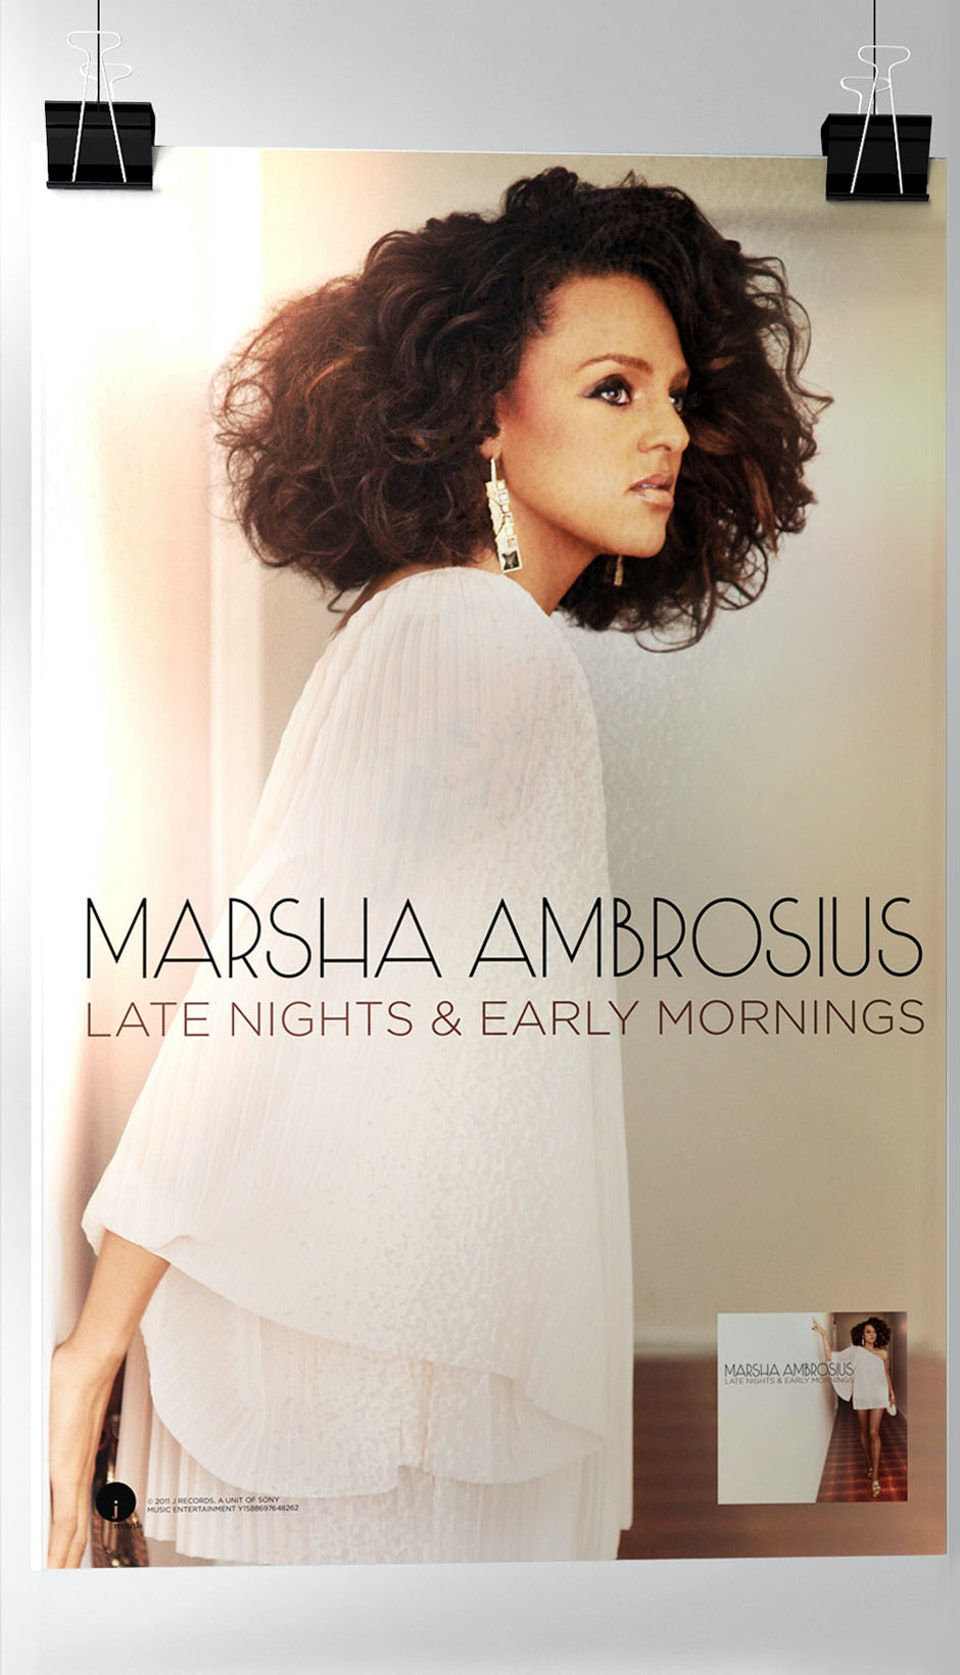 Marsha Ambrosius Late Nights & Early Mornings & Photo Shoot